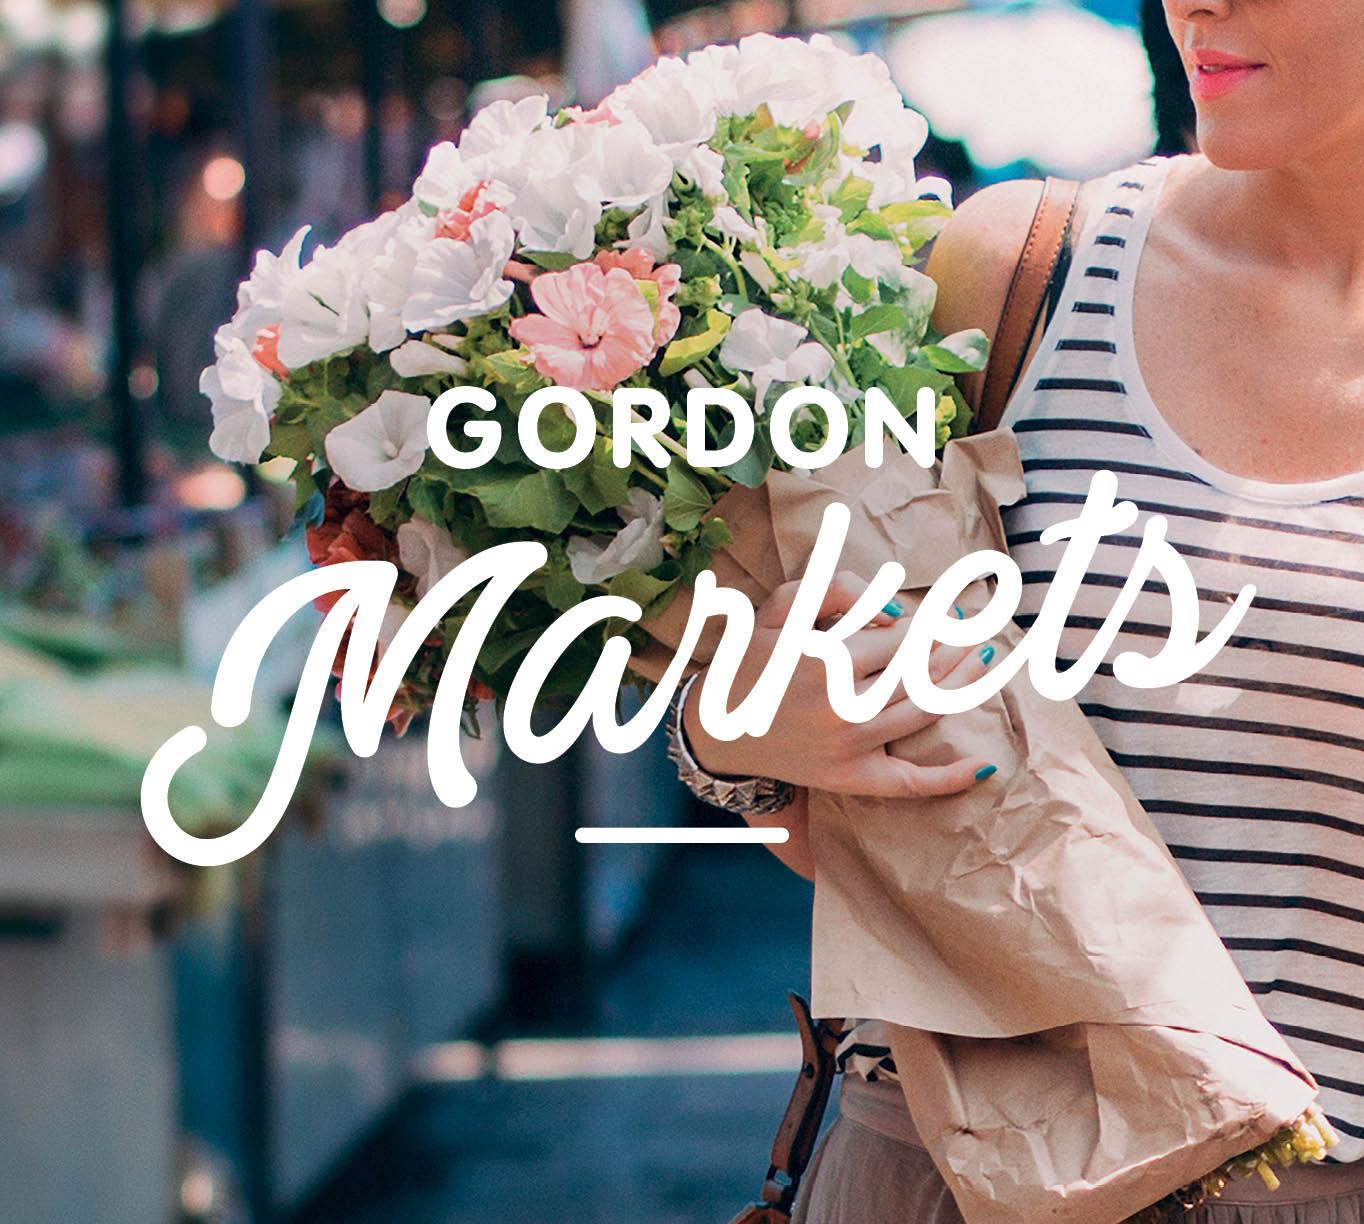 CH4774_Charter Hall_Gordon Market Creative_WebTiles_FA_682x612px